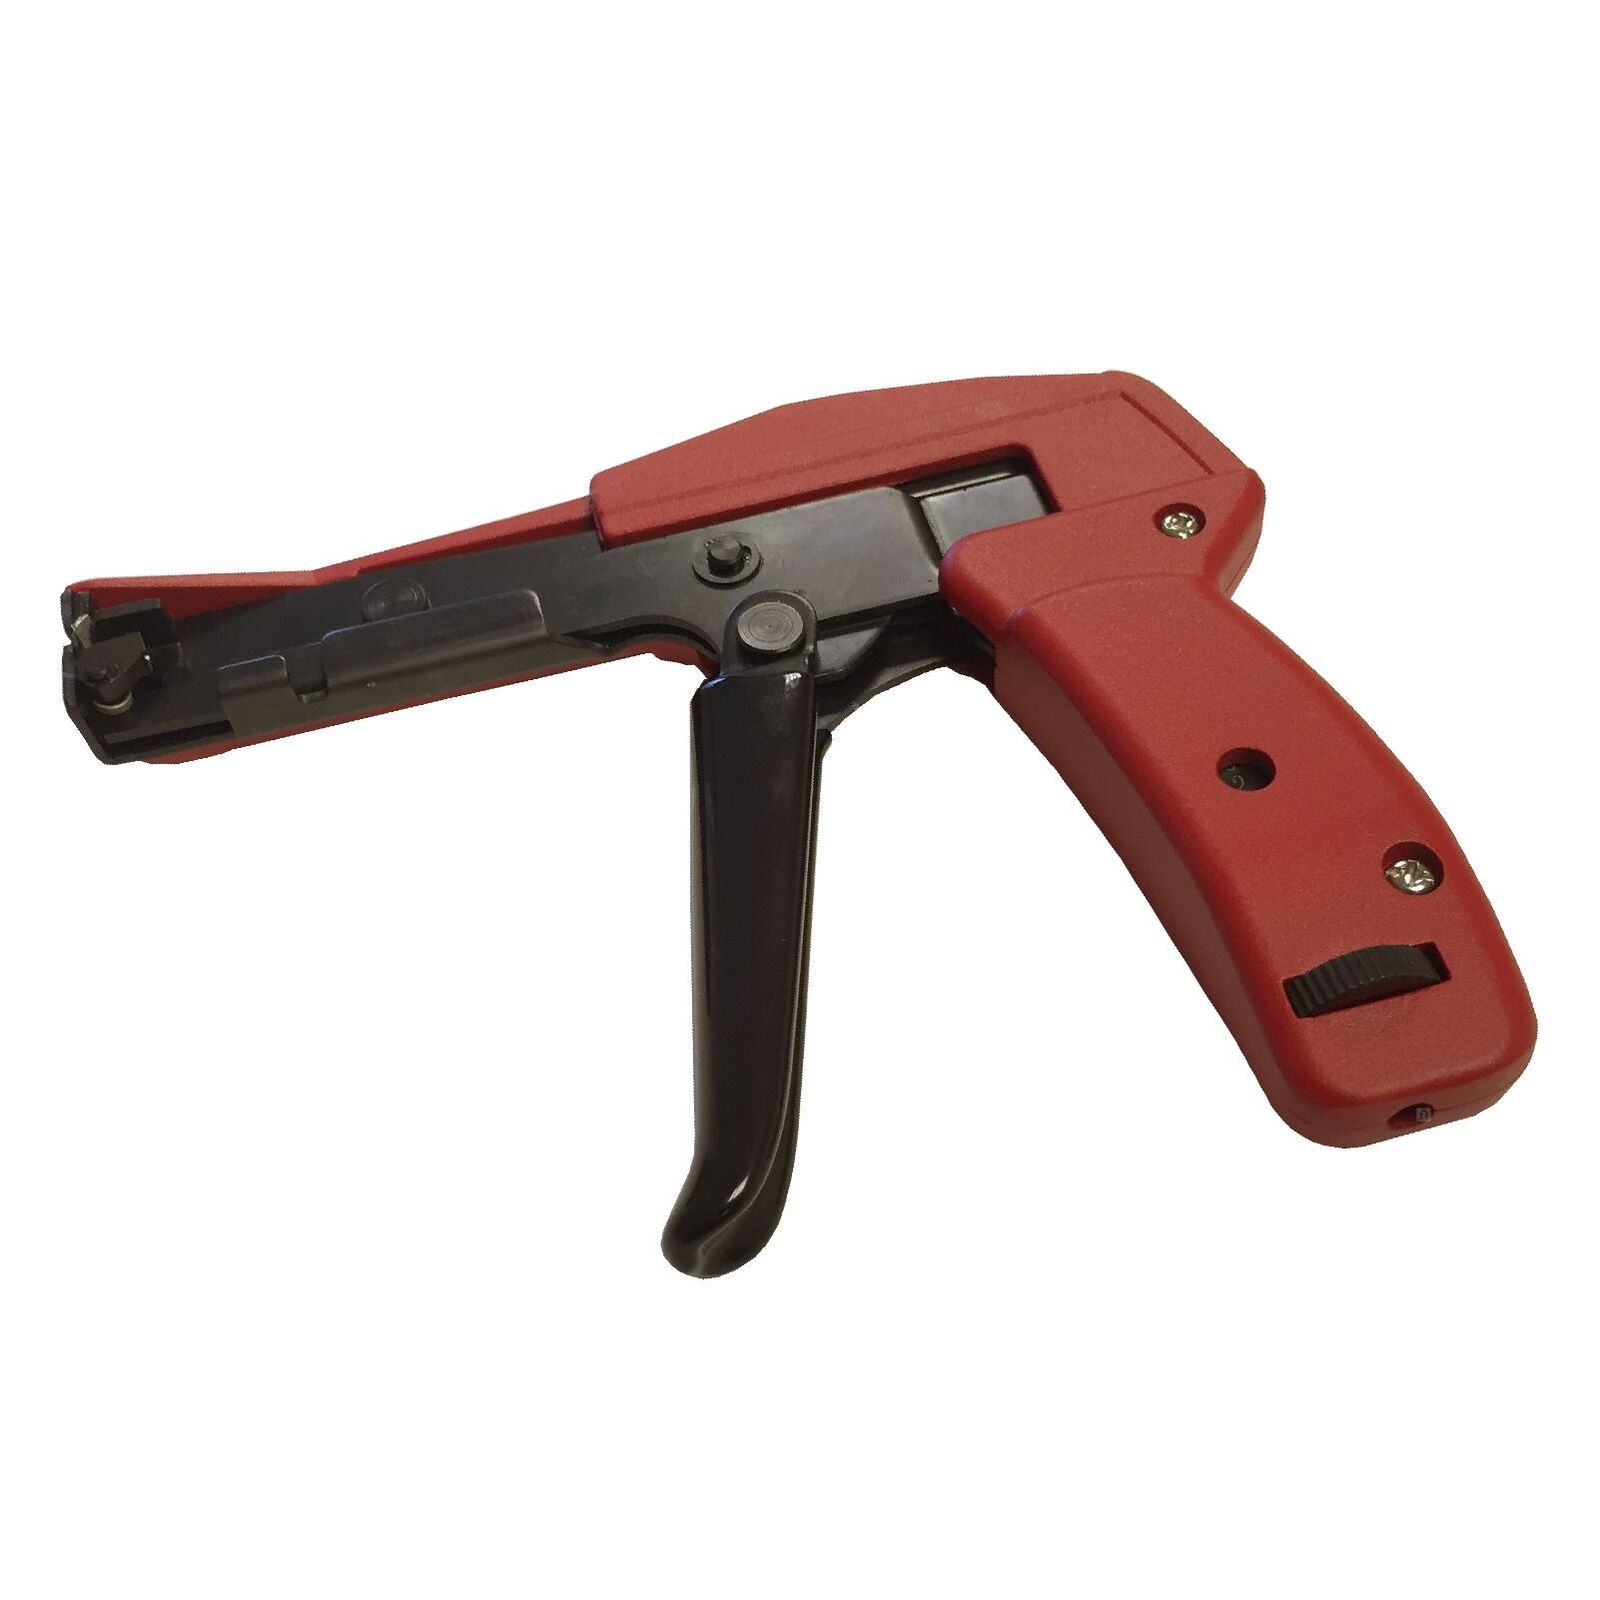 Heavy Duty Cable Tie Gun Tensioner & Cutter Tool for 2.4 - 4.8mm Nylon Zip Ties